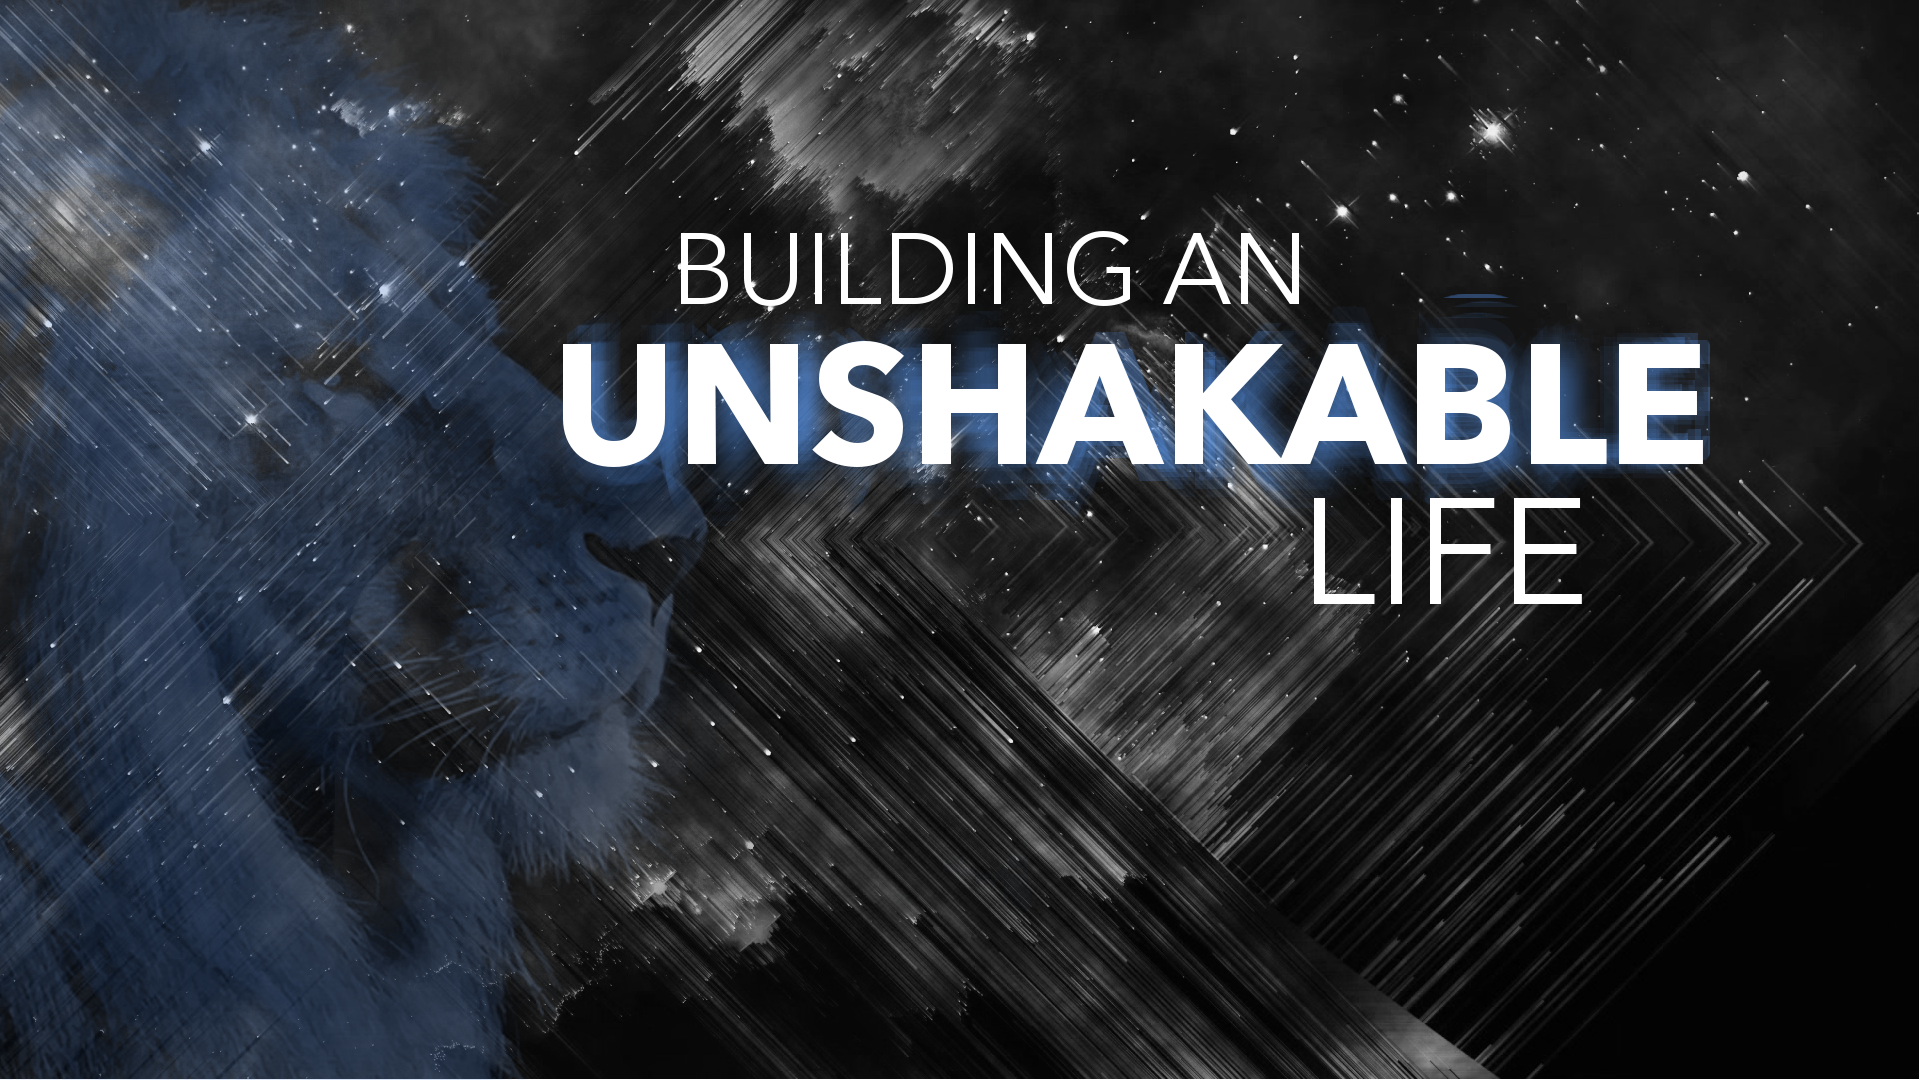 Unshakable Life Title Slide.png